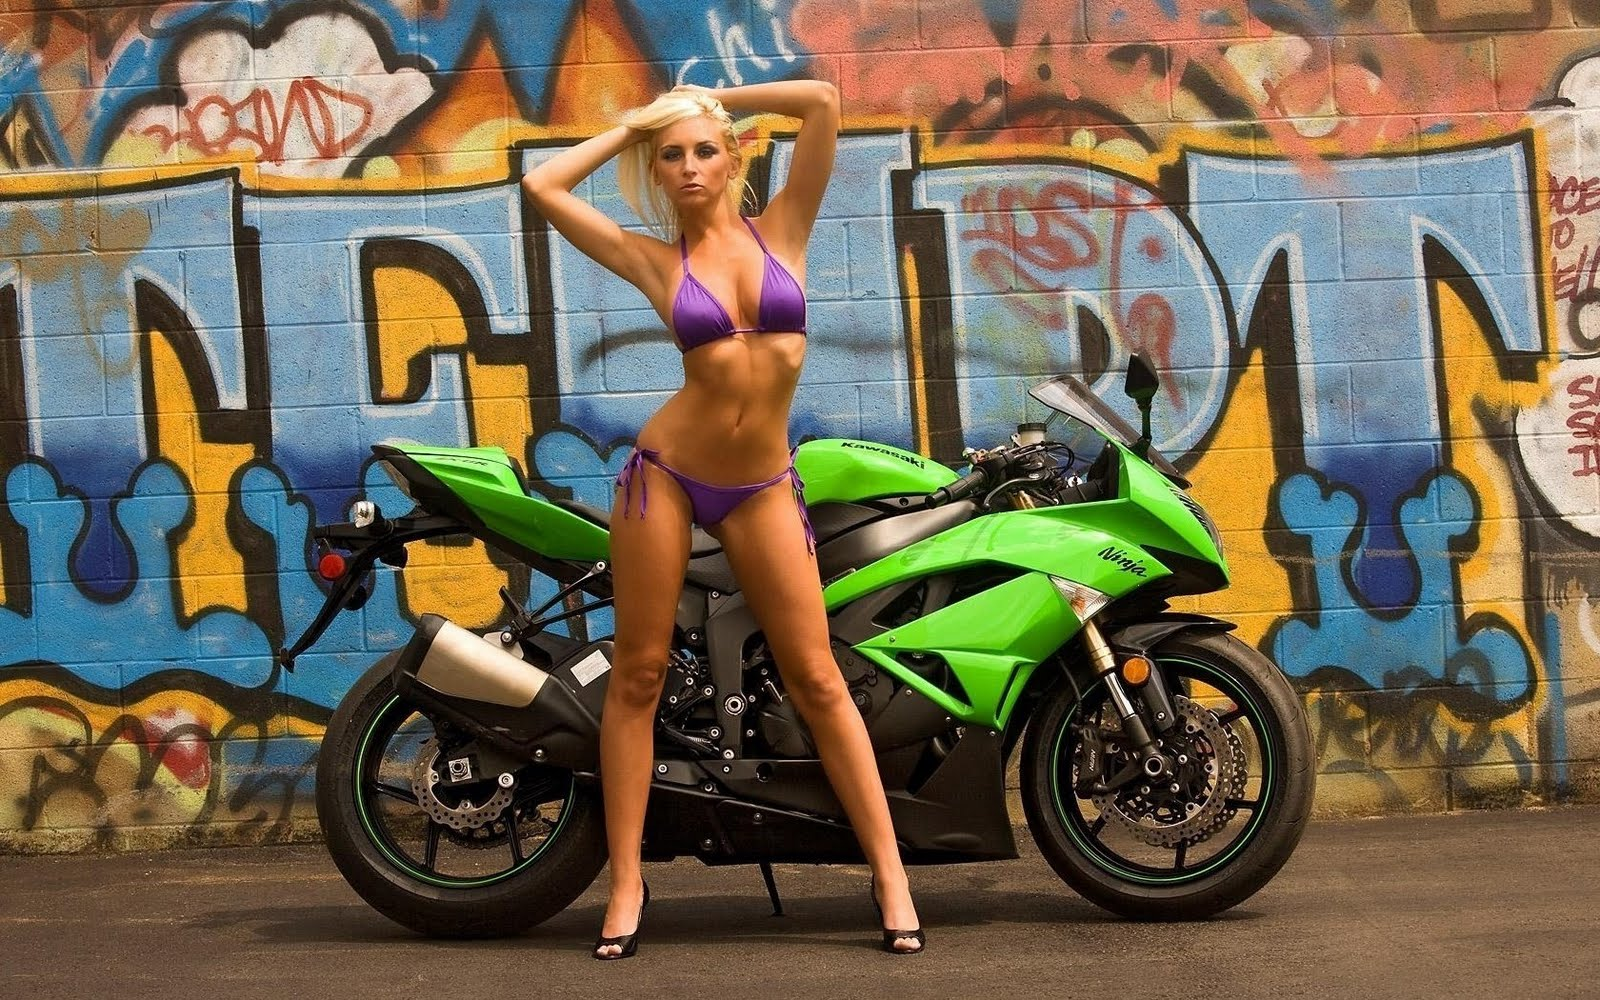 Hot Girls On Bike Wallpaper Pack 3  Cute Celebrity